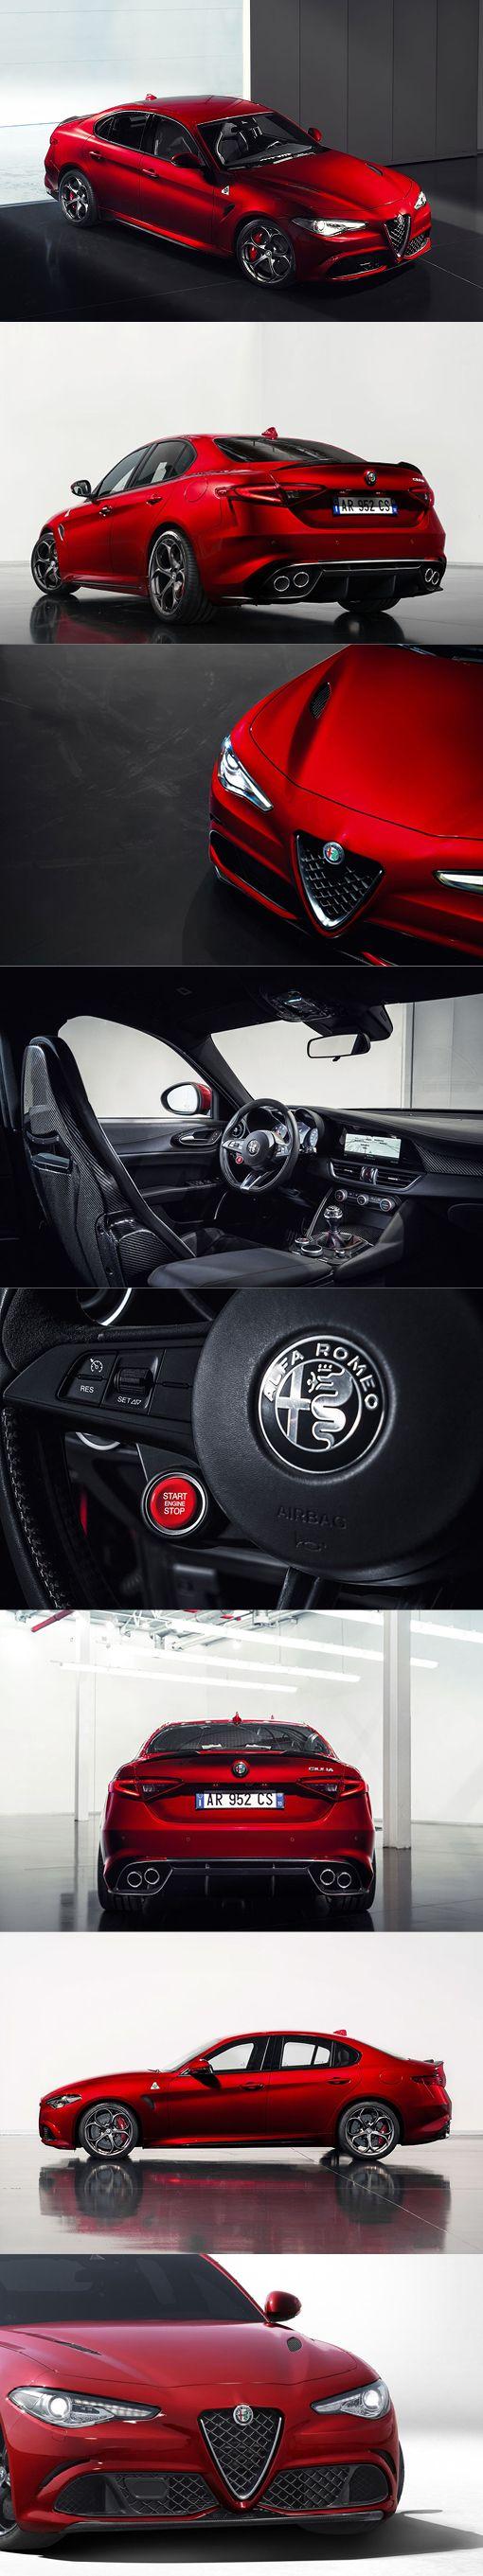 2015 Alfa Romeo Giulia Quadrifoglio / Italy / red / 503 hp